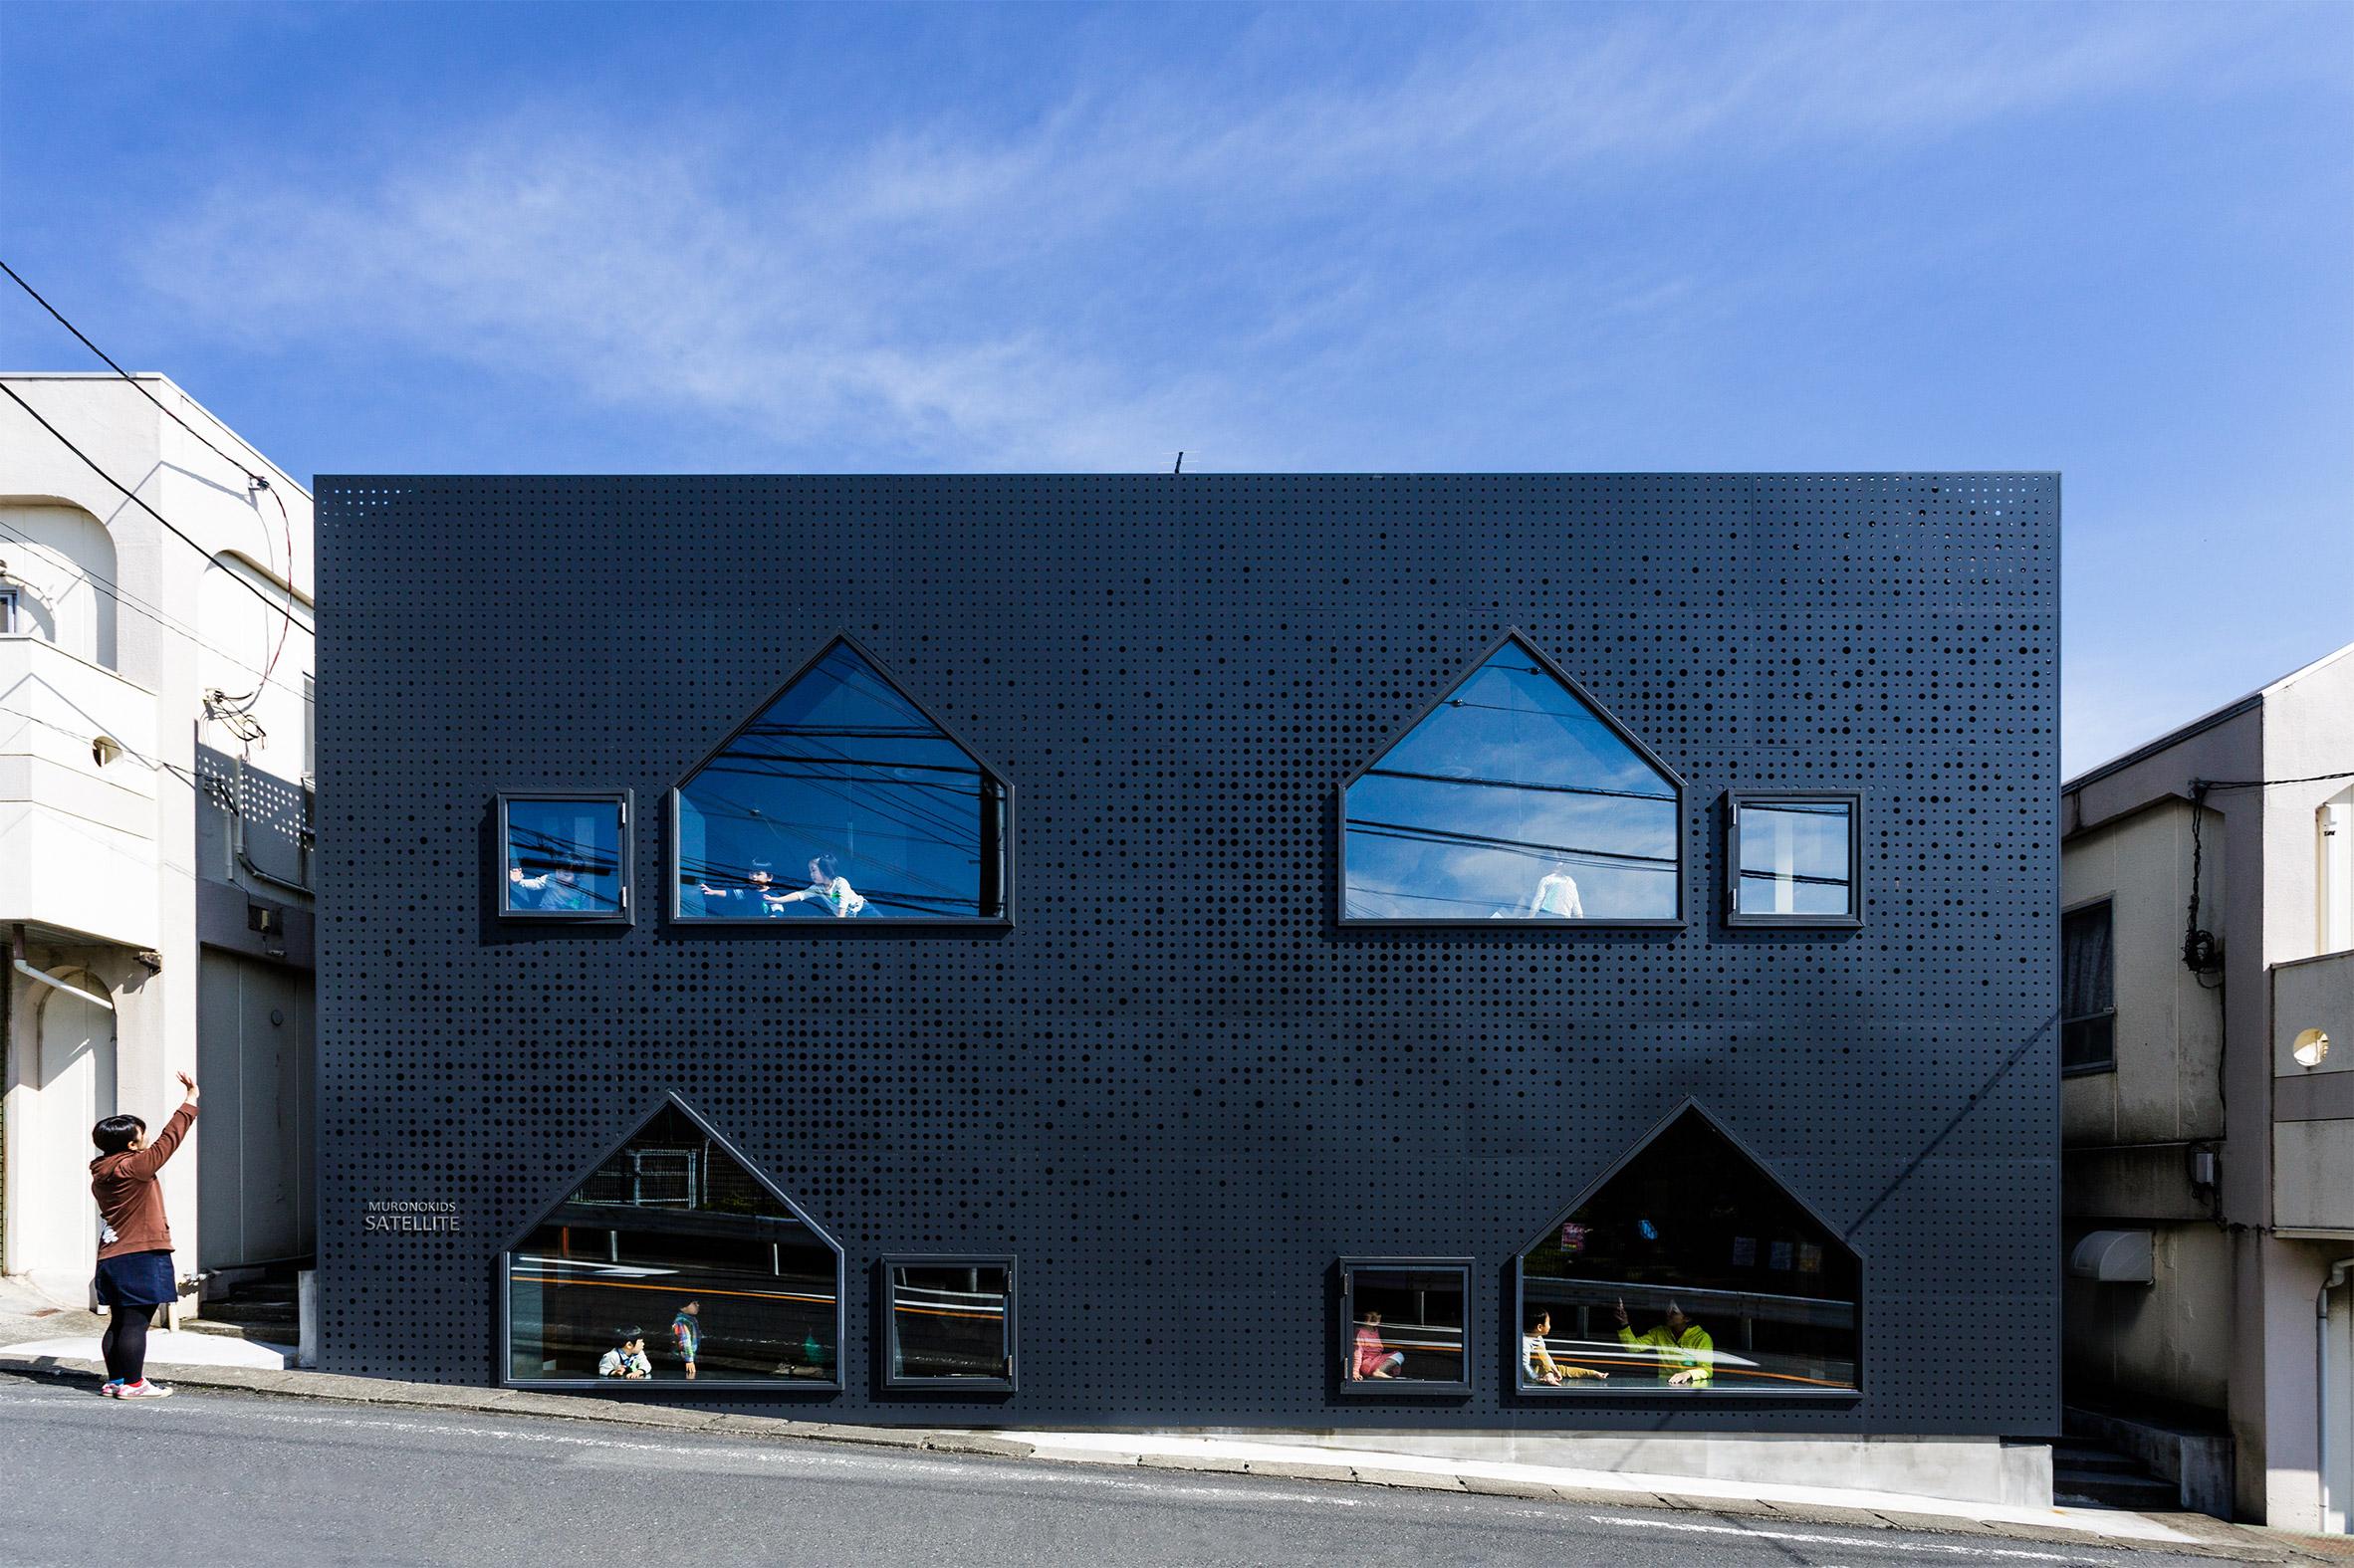 House-shaped windows puncture perforated metal facades of Yokohama nursery